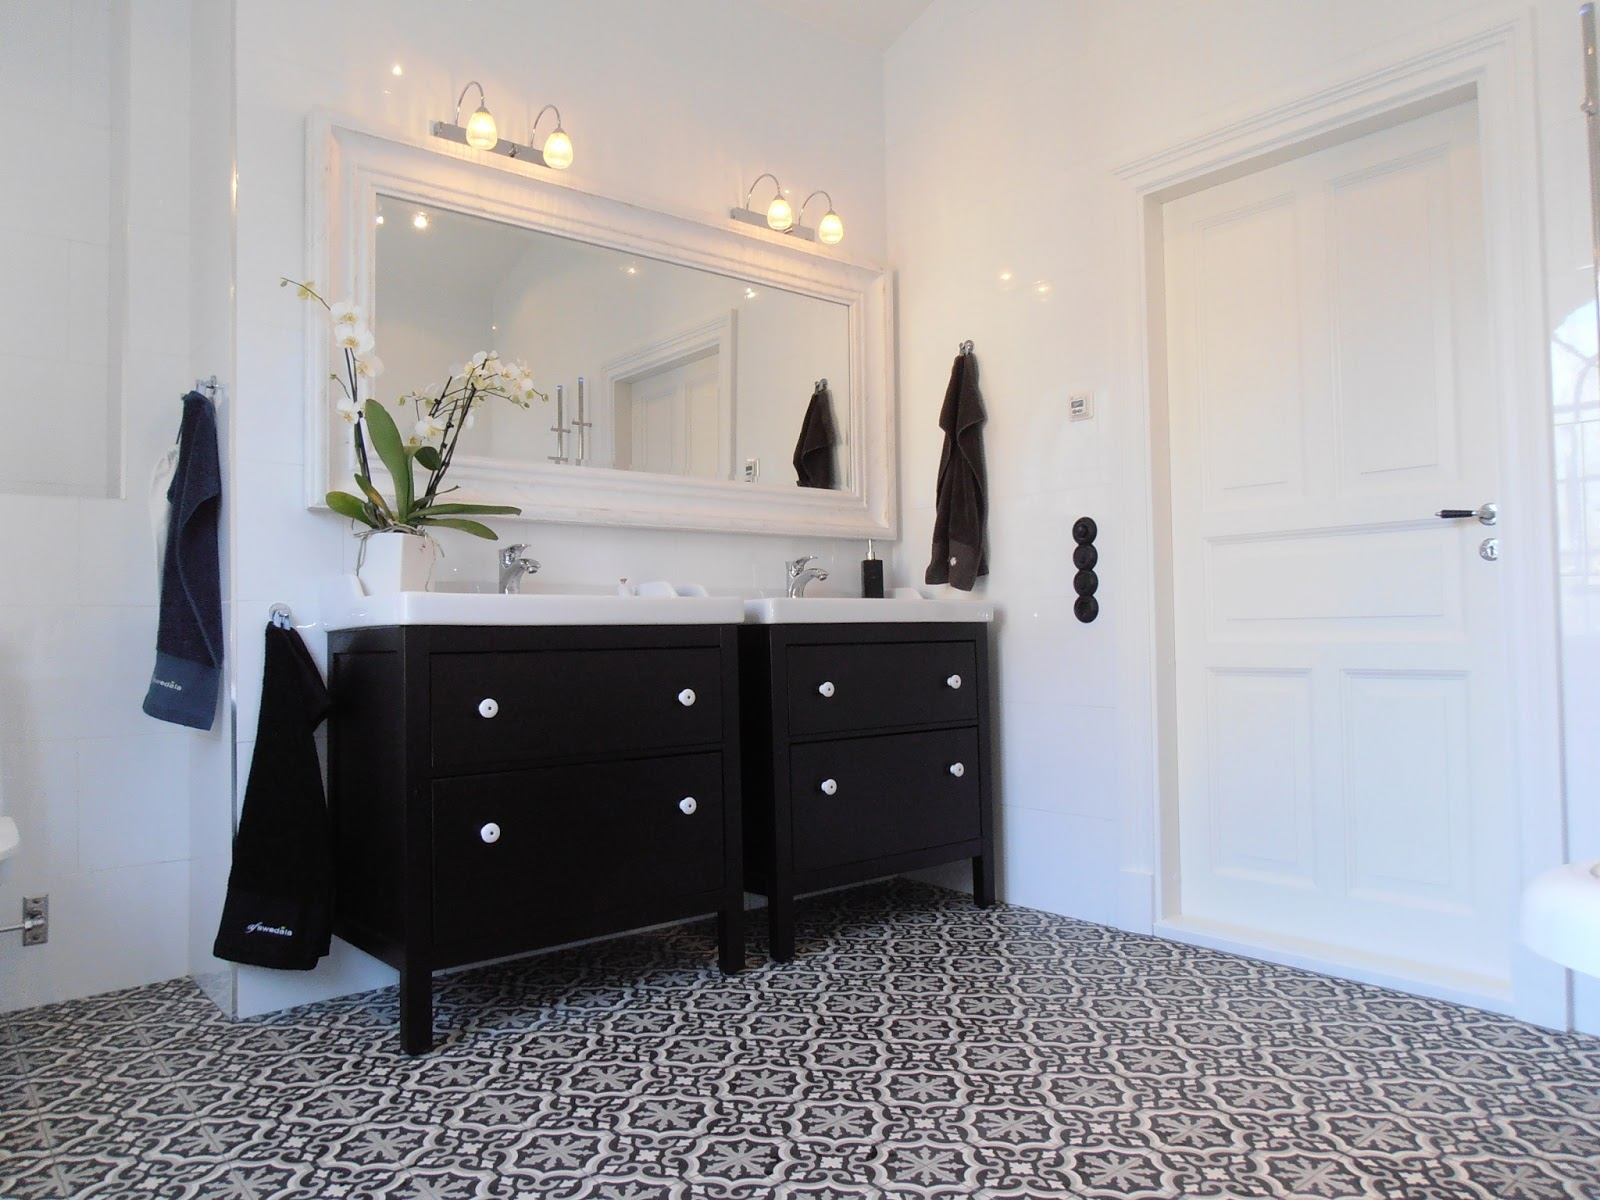 Luxury Moroccan Tiles And A White Hemnes Bathroom